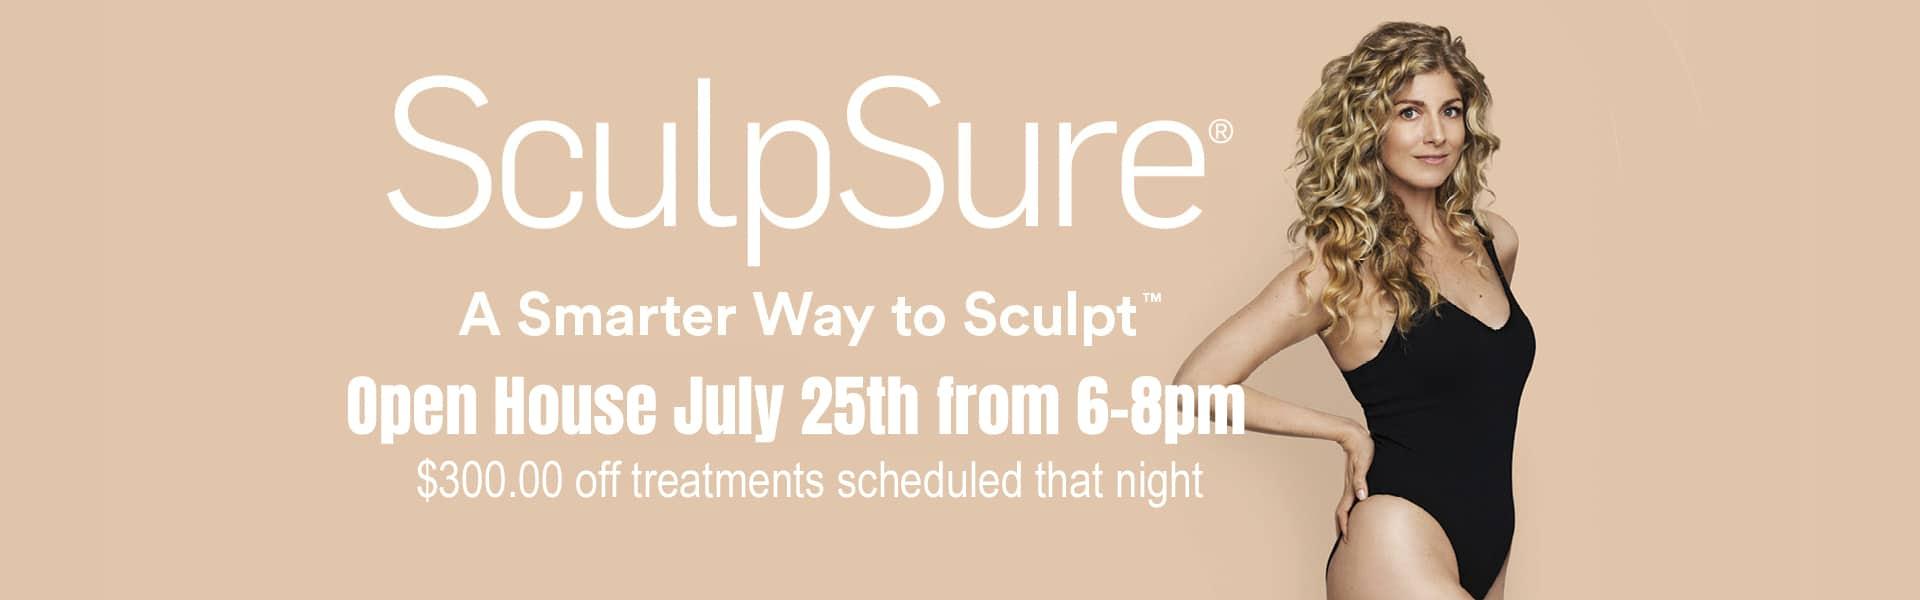 SculpSure-Colorado-Springs-v3-OpenHouse